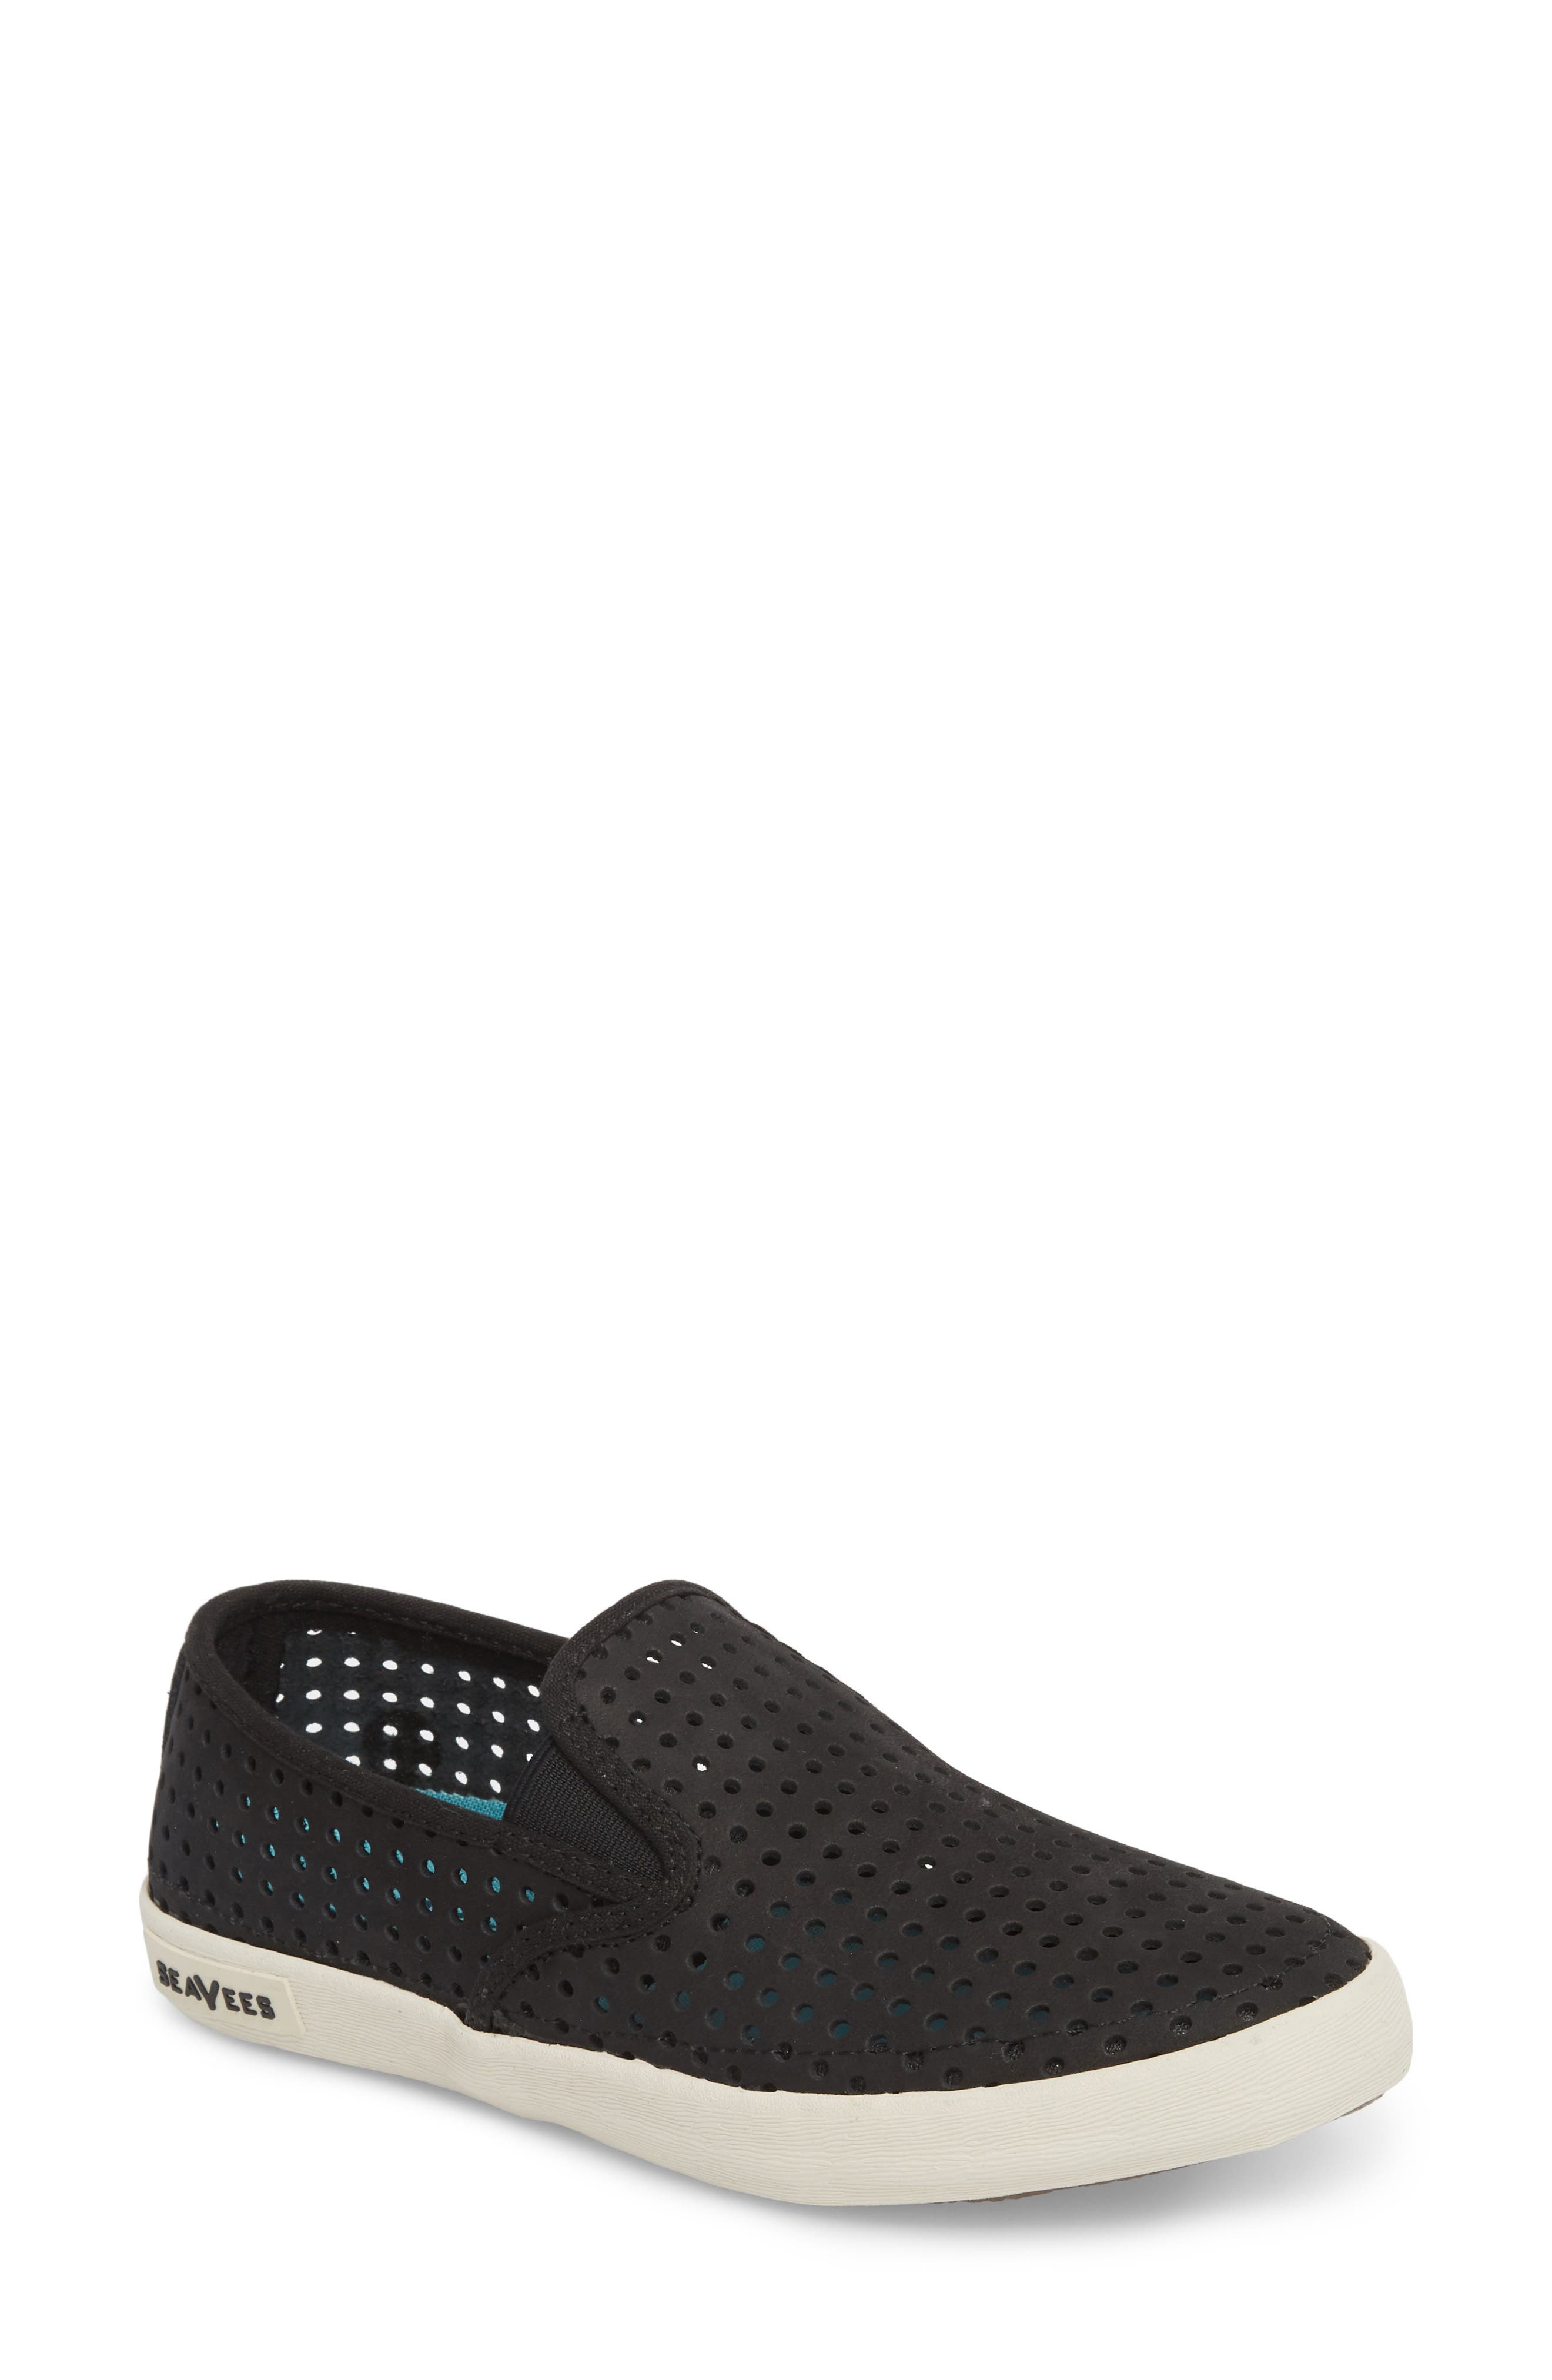 Baja Perforated Slip-On Sneaker,                             Main thumbnail 1, color,                             BLACK